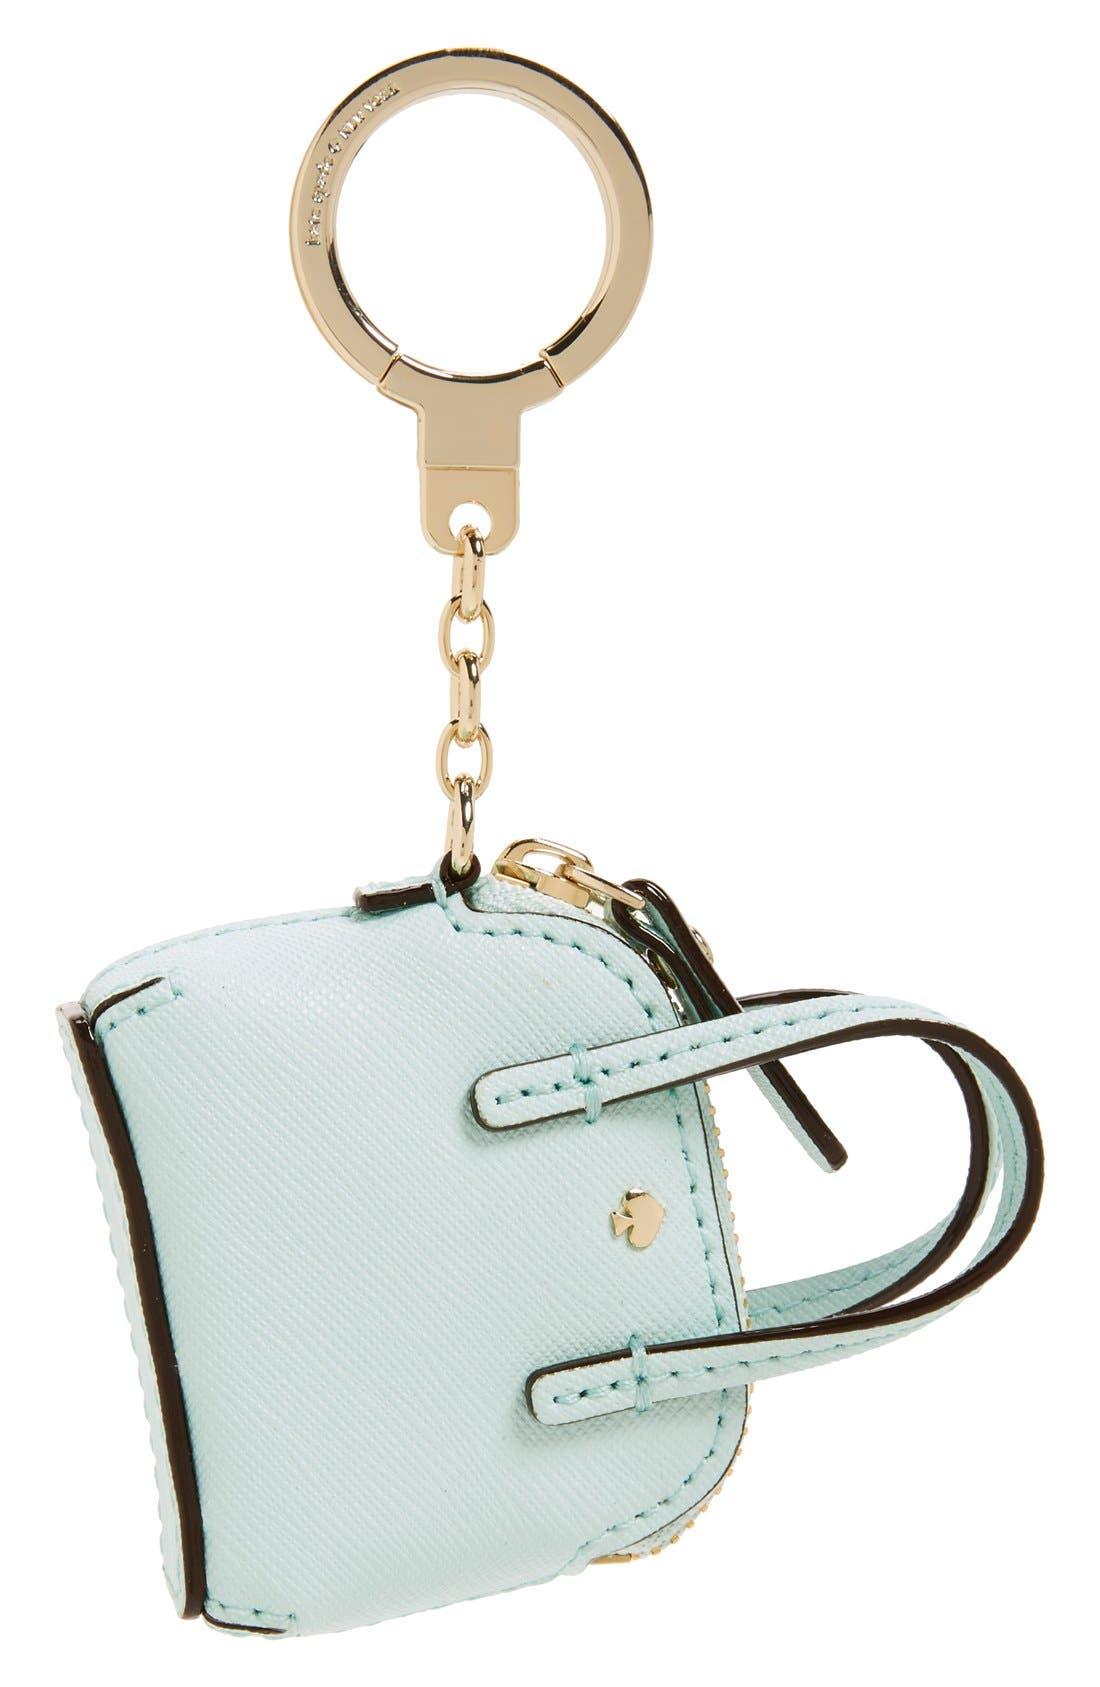 Main Image - kate spade new york 'things we love - maise' bag charm